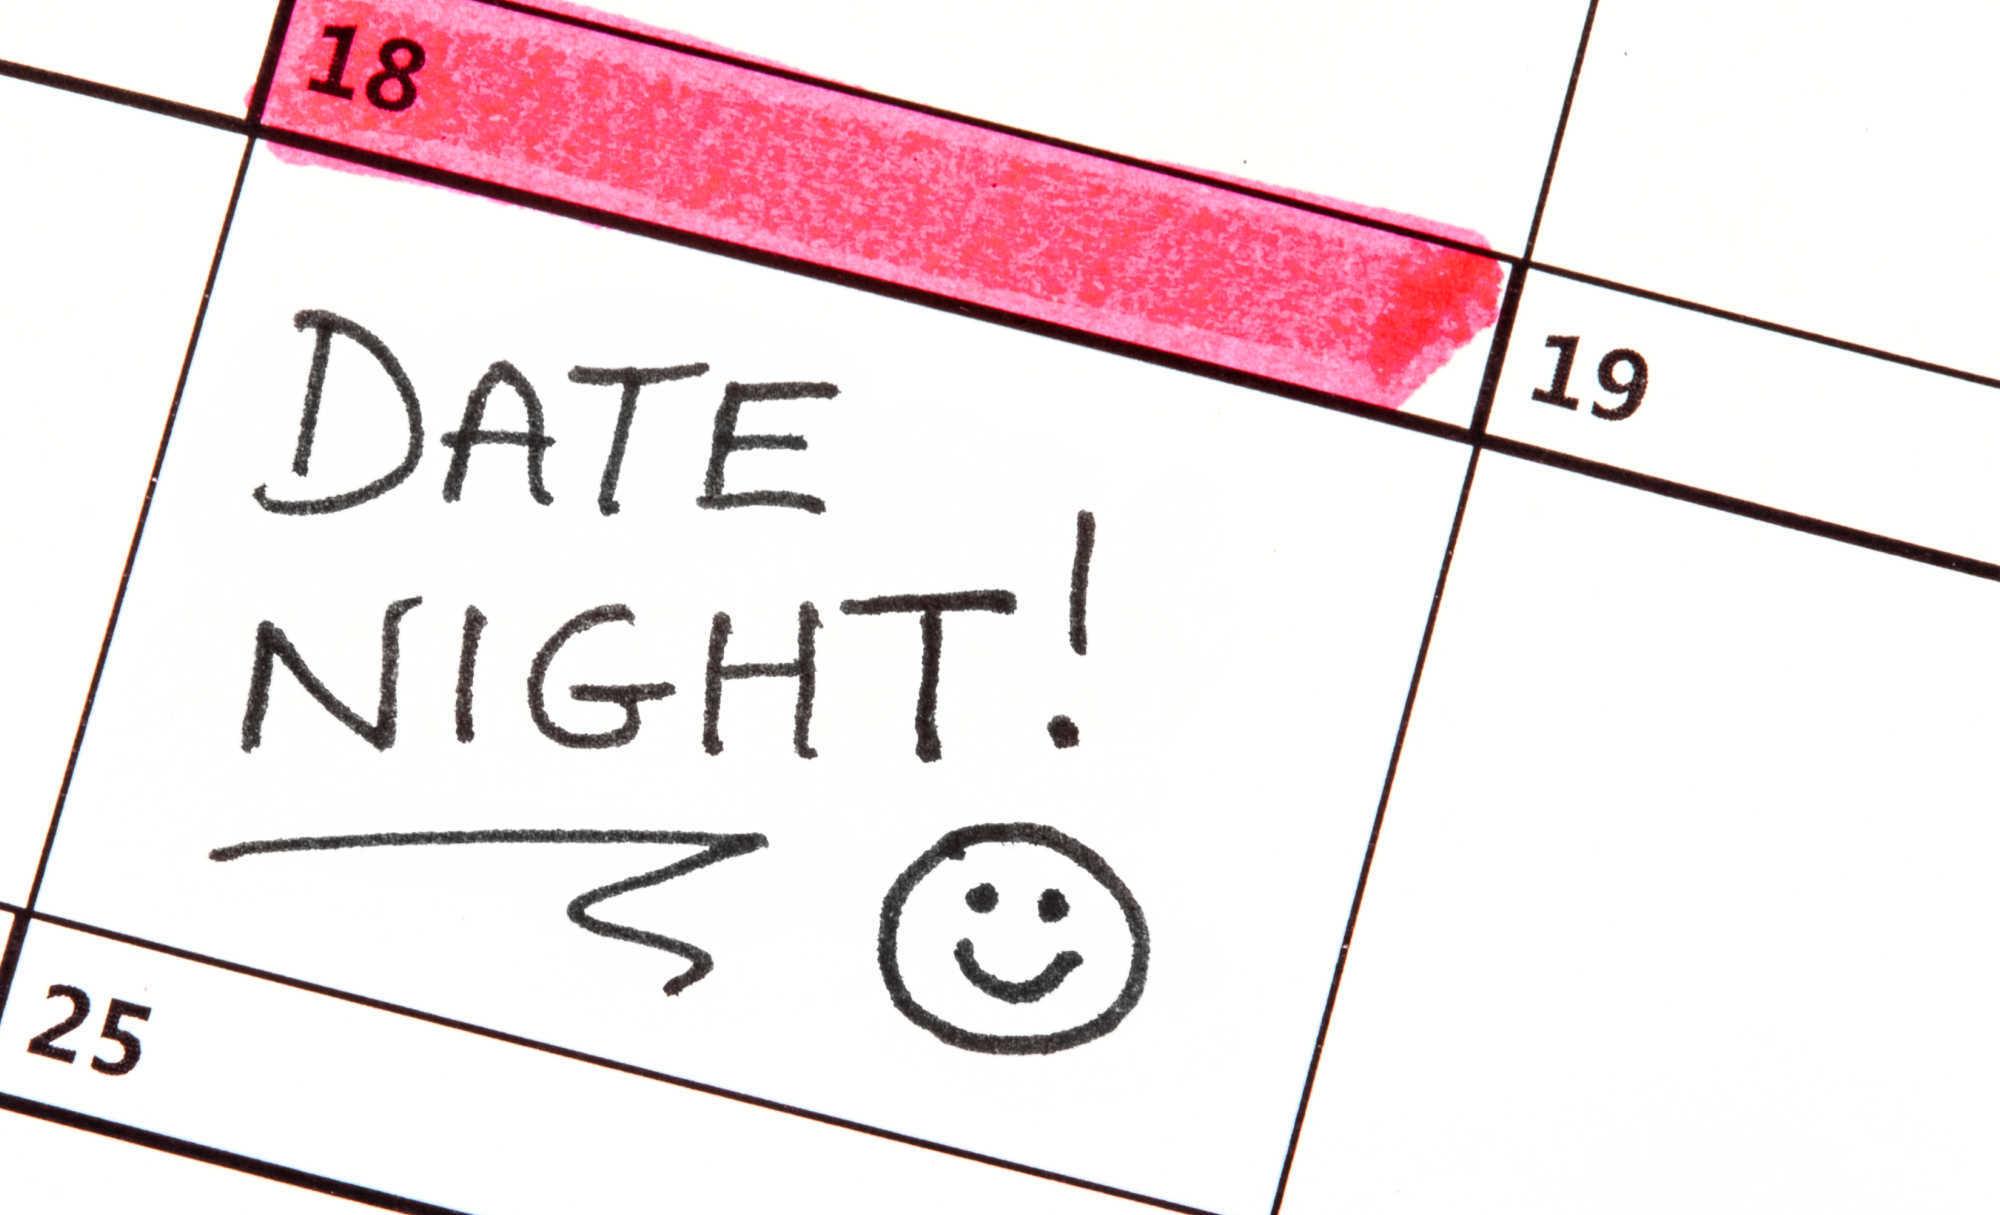 A date night highlighted on a calendar